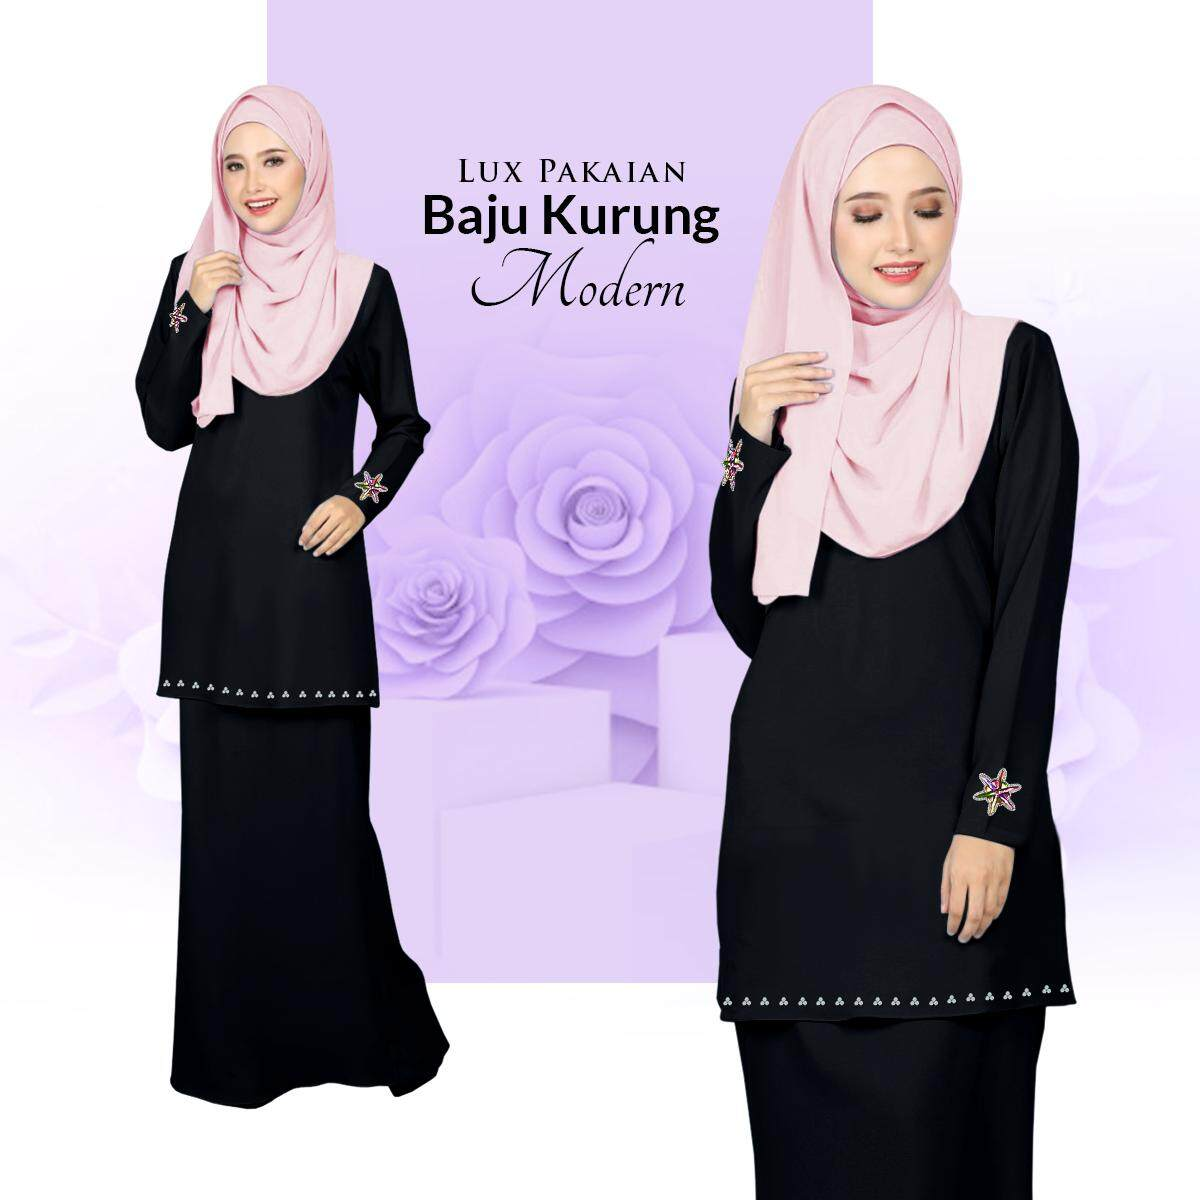 New Collection Lux Pakaian Baju Kurung Modern with Stylish Bunch & Batu Terkini